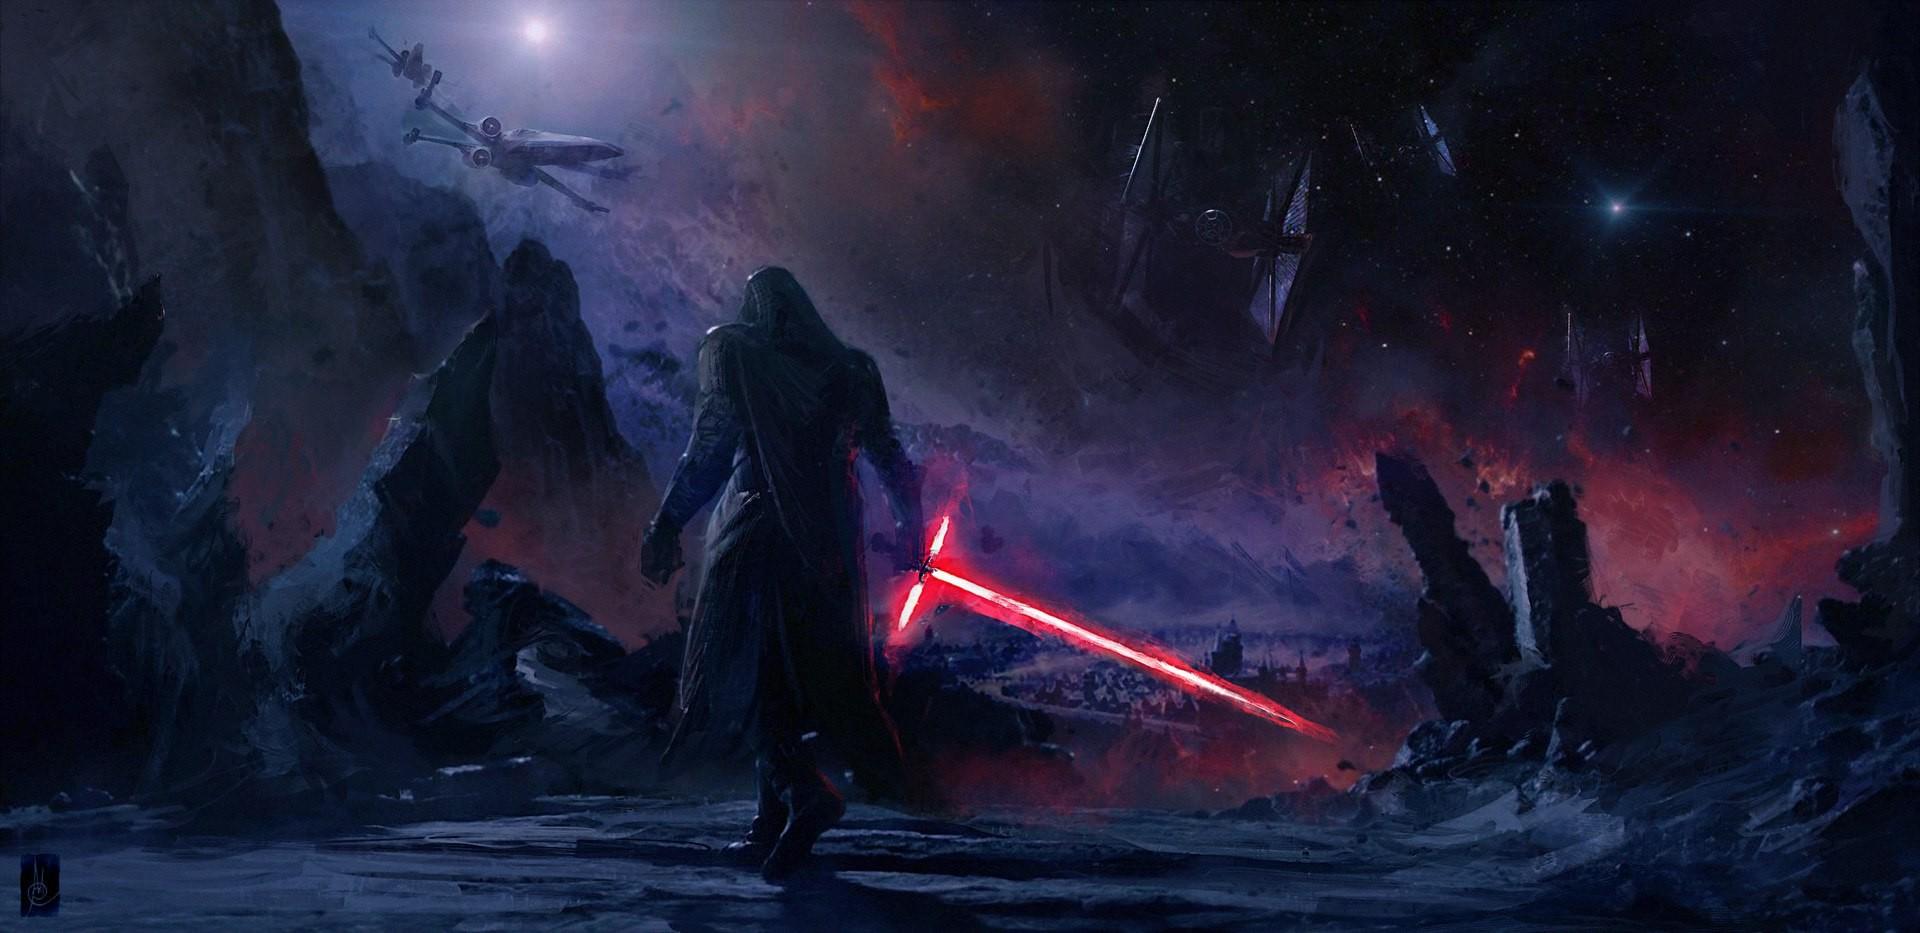 Wars Kylo Ren Star Wars Episode VII The Force Awakens Wallpapers HD 1920x933